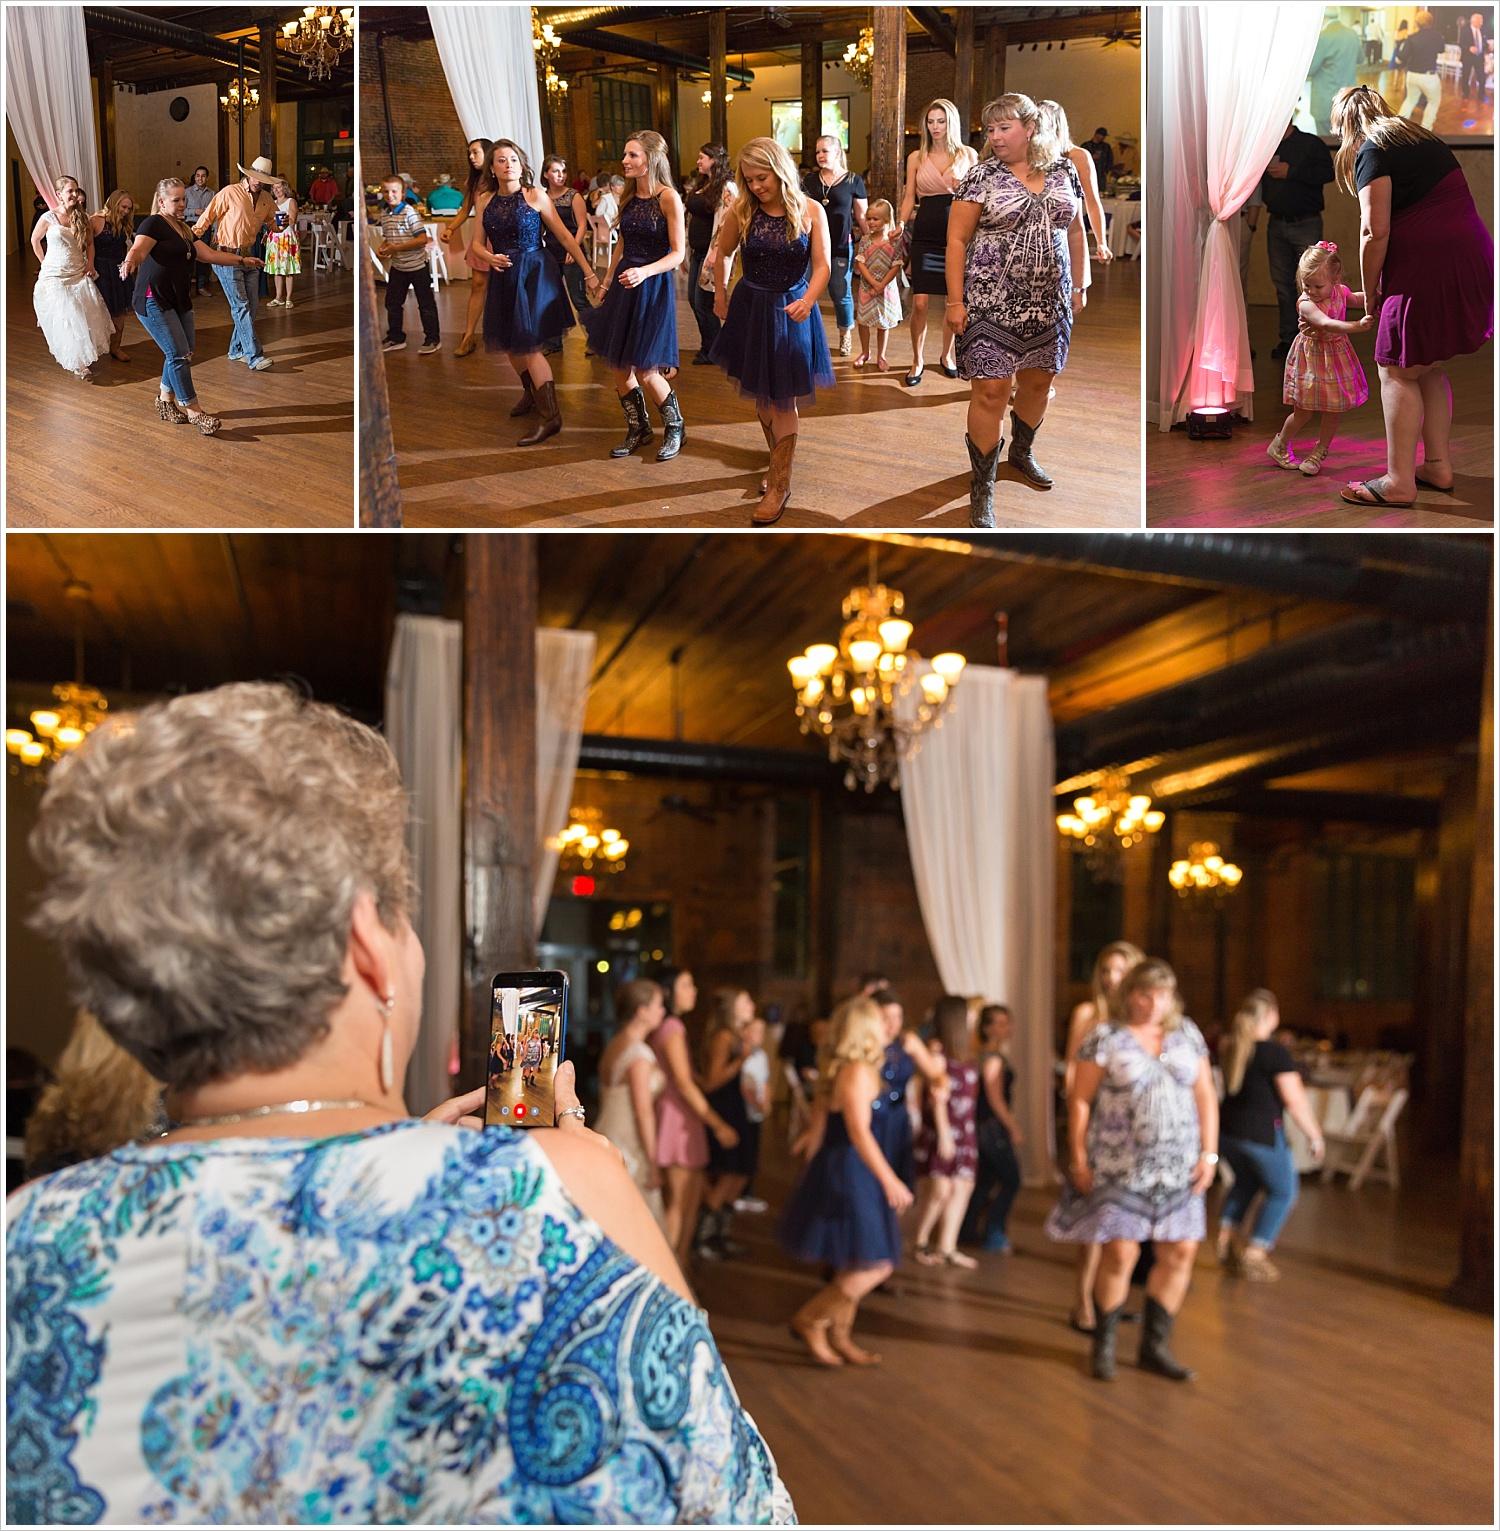 Bride and bridal party dance at reception,Navy and blush Texas Reception at The Phoenix Ballroom, Jason & Melaina Photography - www.jasonandmelaina.com